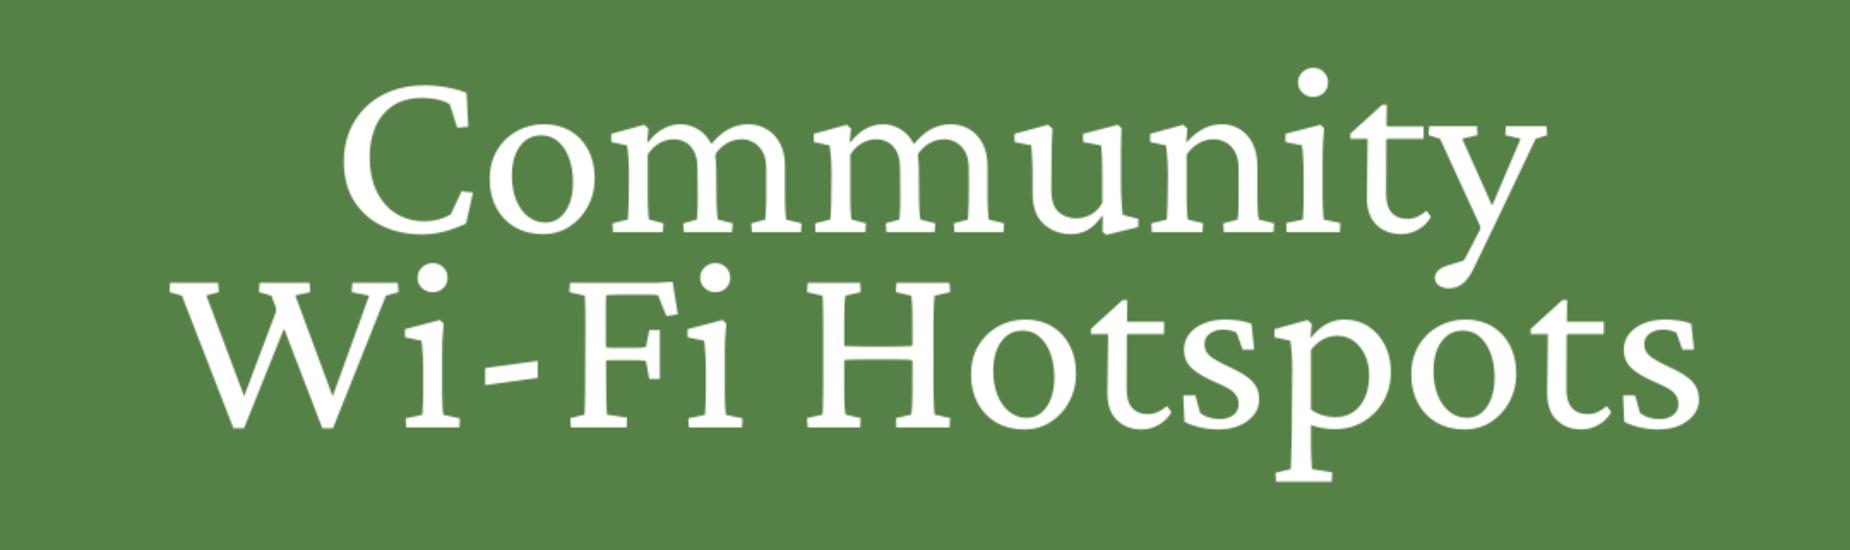 Community Wifi Hotspots List